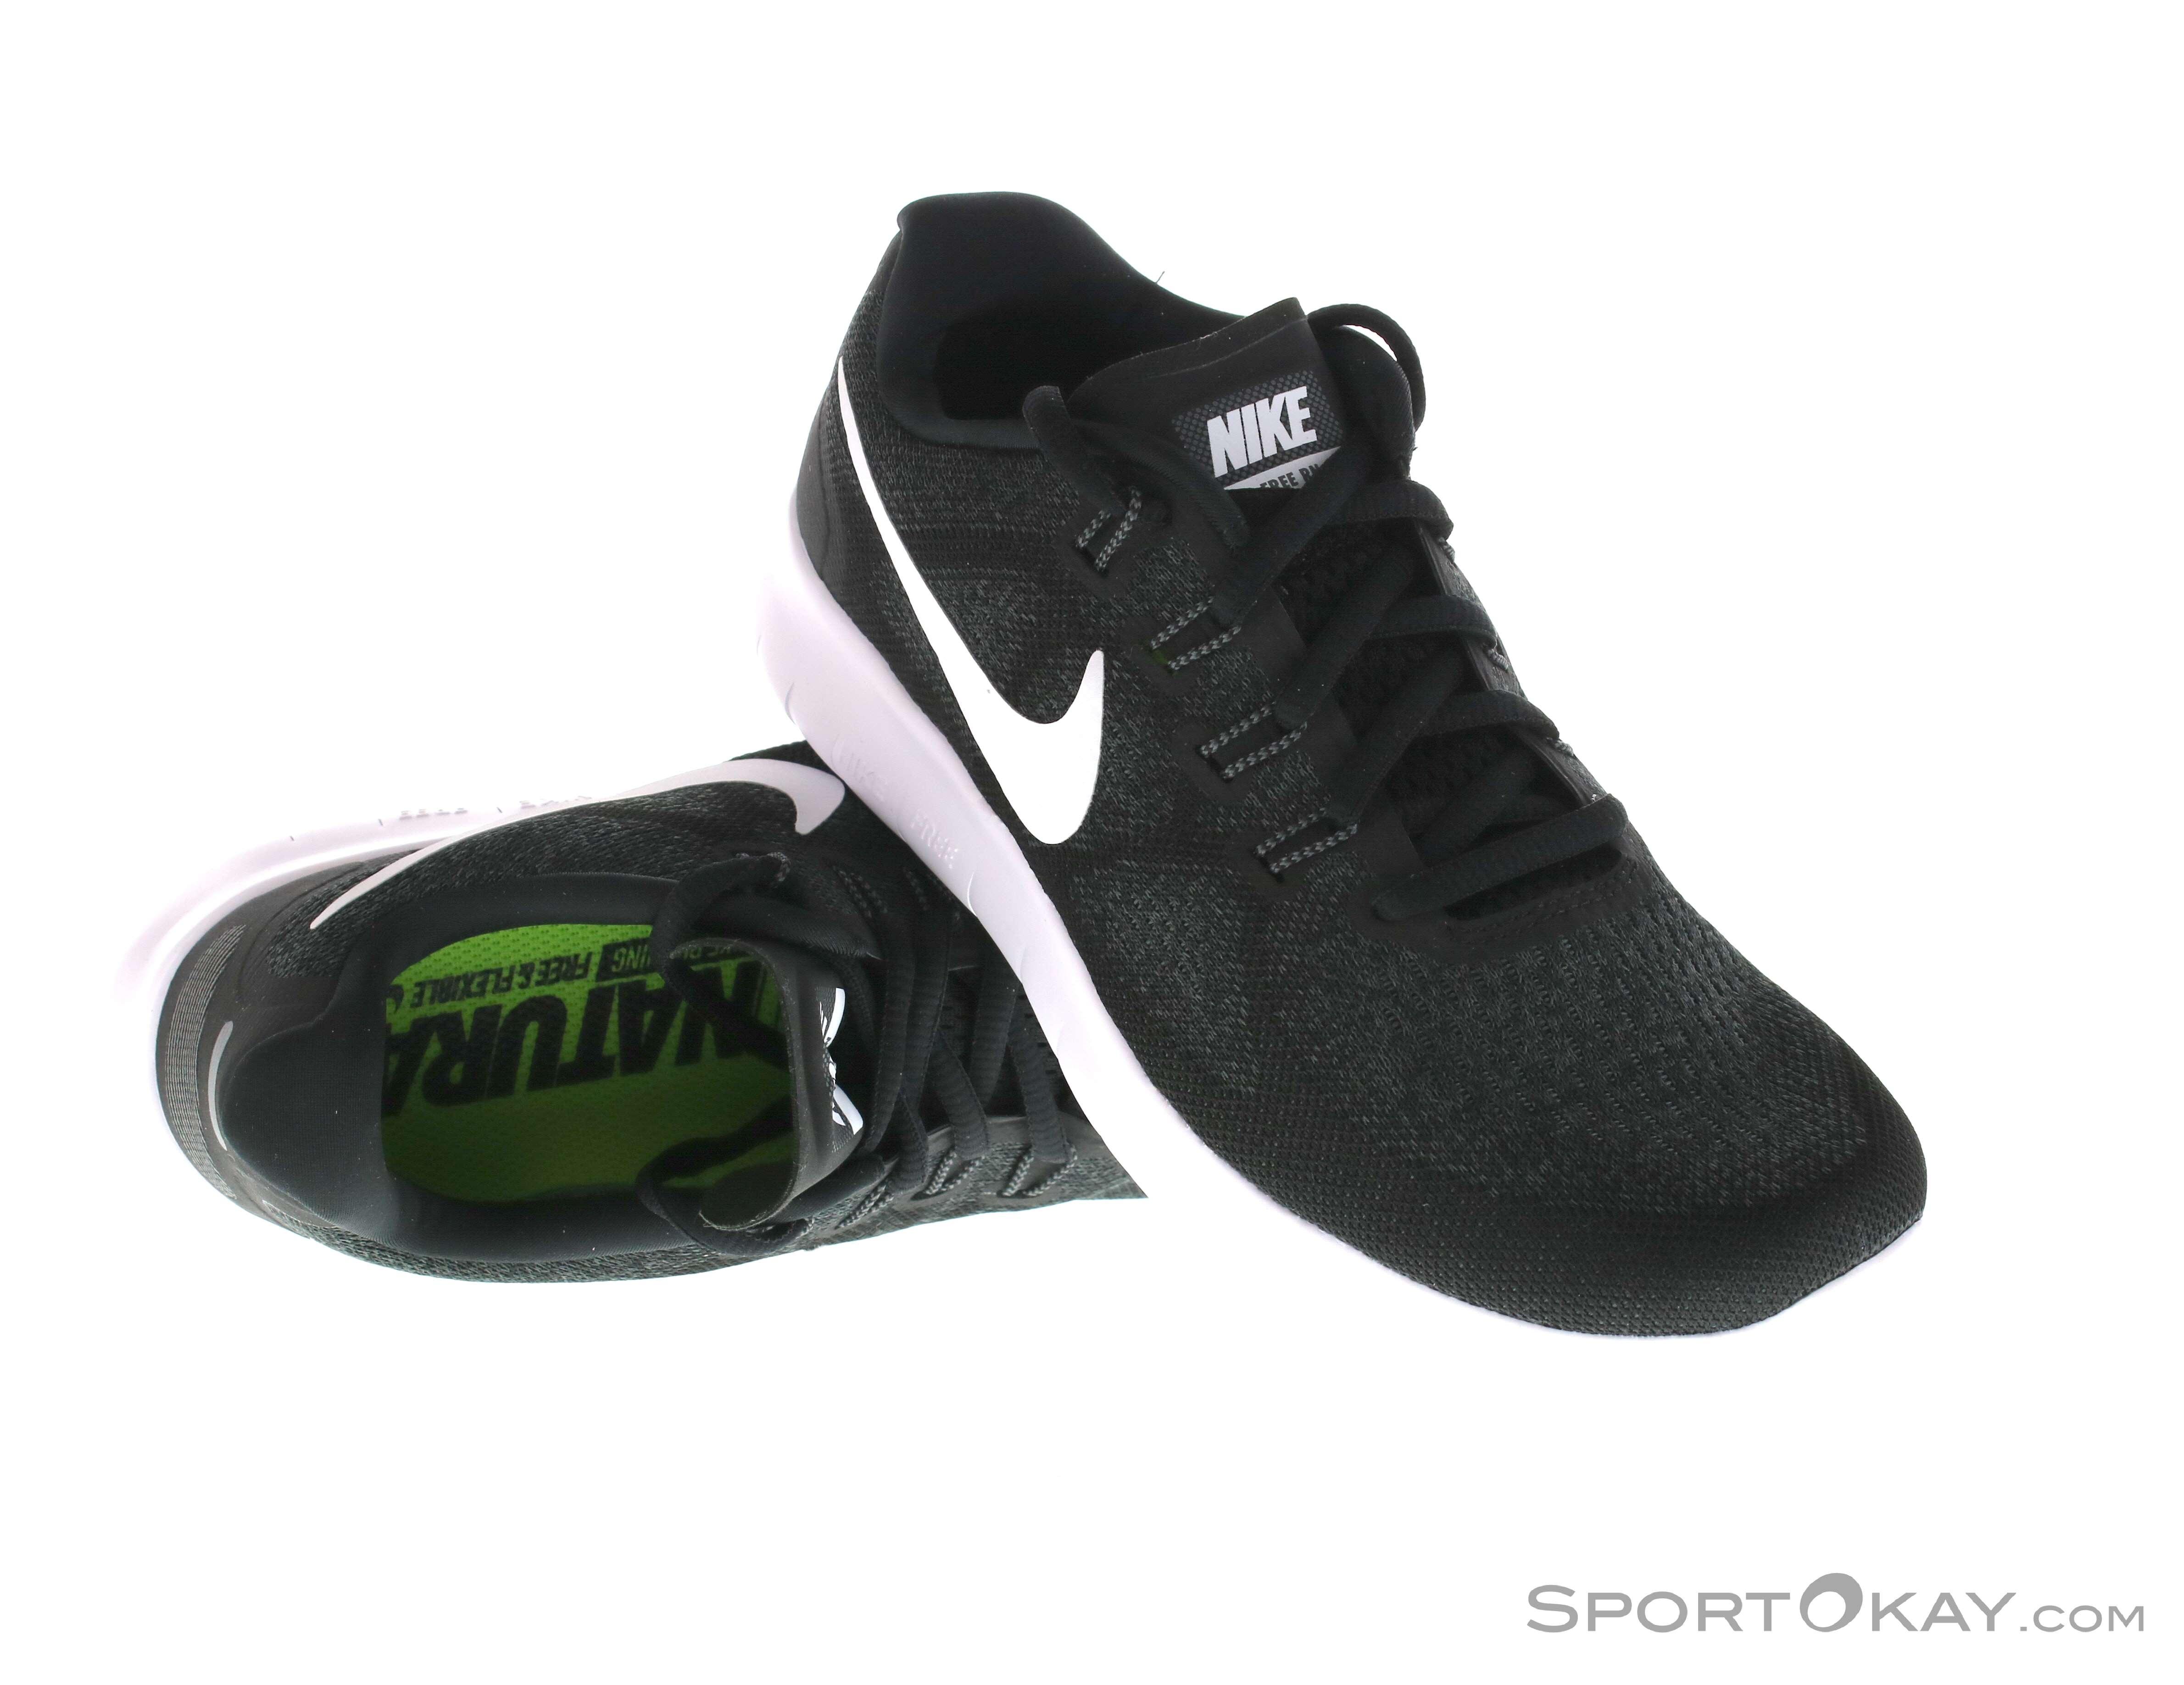 7c852ee0ba691 Nike Free Run 2 Damen Laufschuhe - Straßenlaufschuhe - Laufschuhe ...